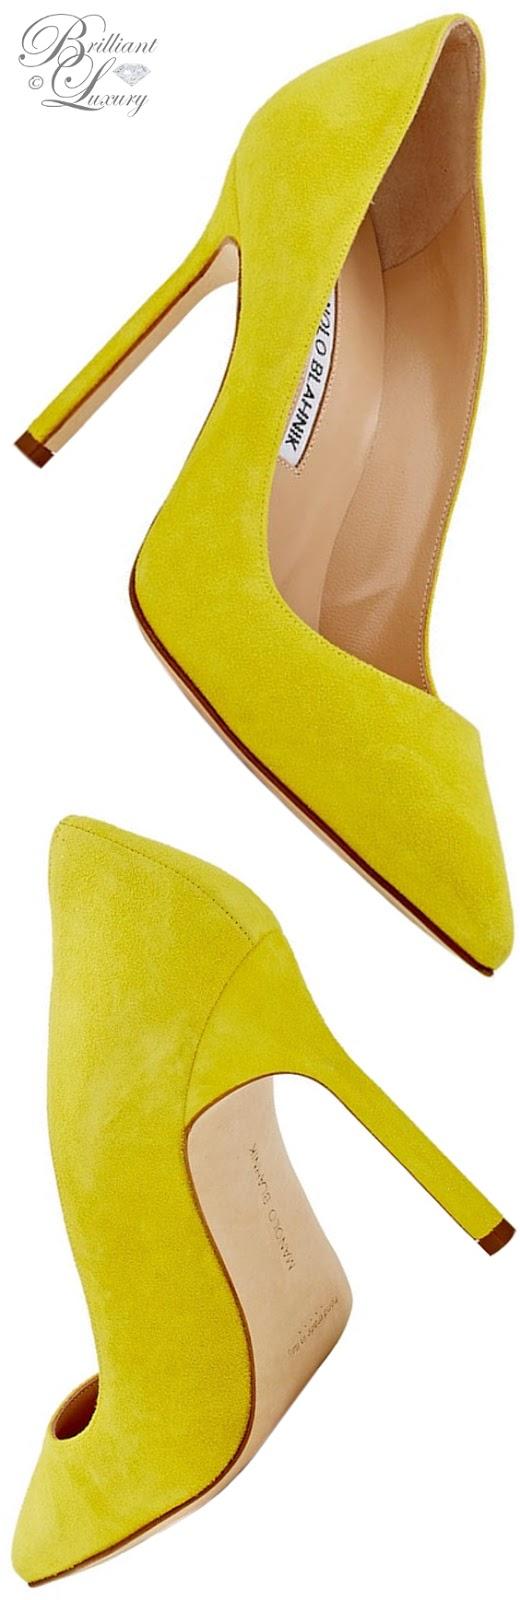 Brilliant Luxury ♦ Manolo Blahnik BB yellow suede pump